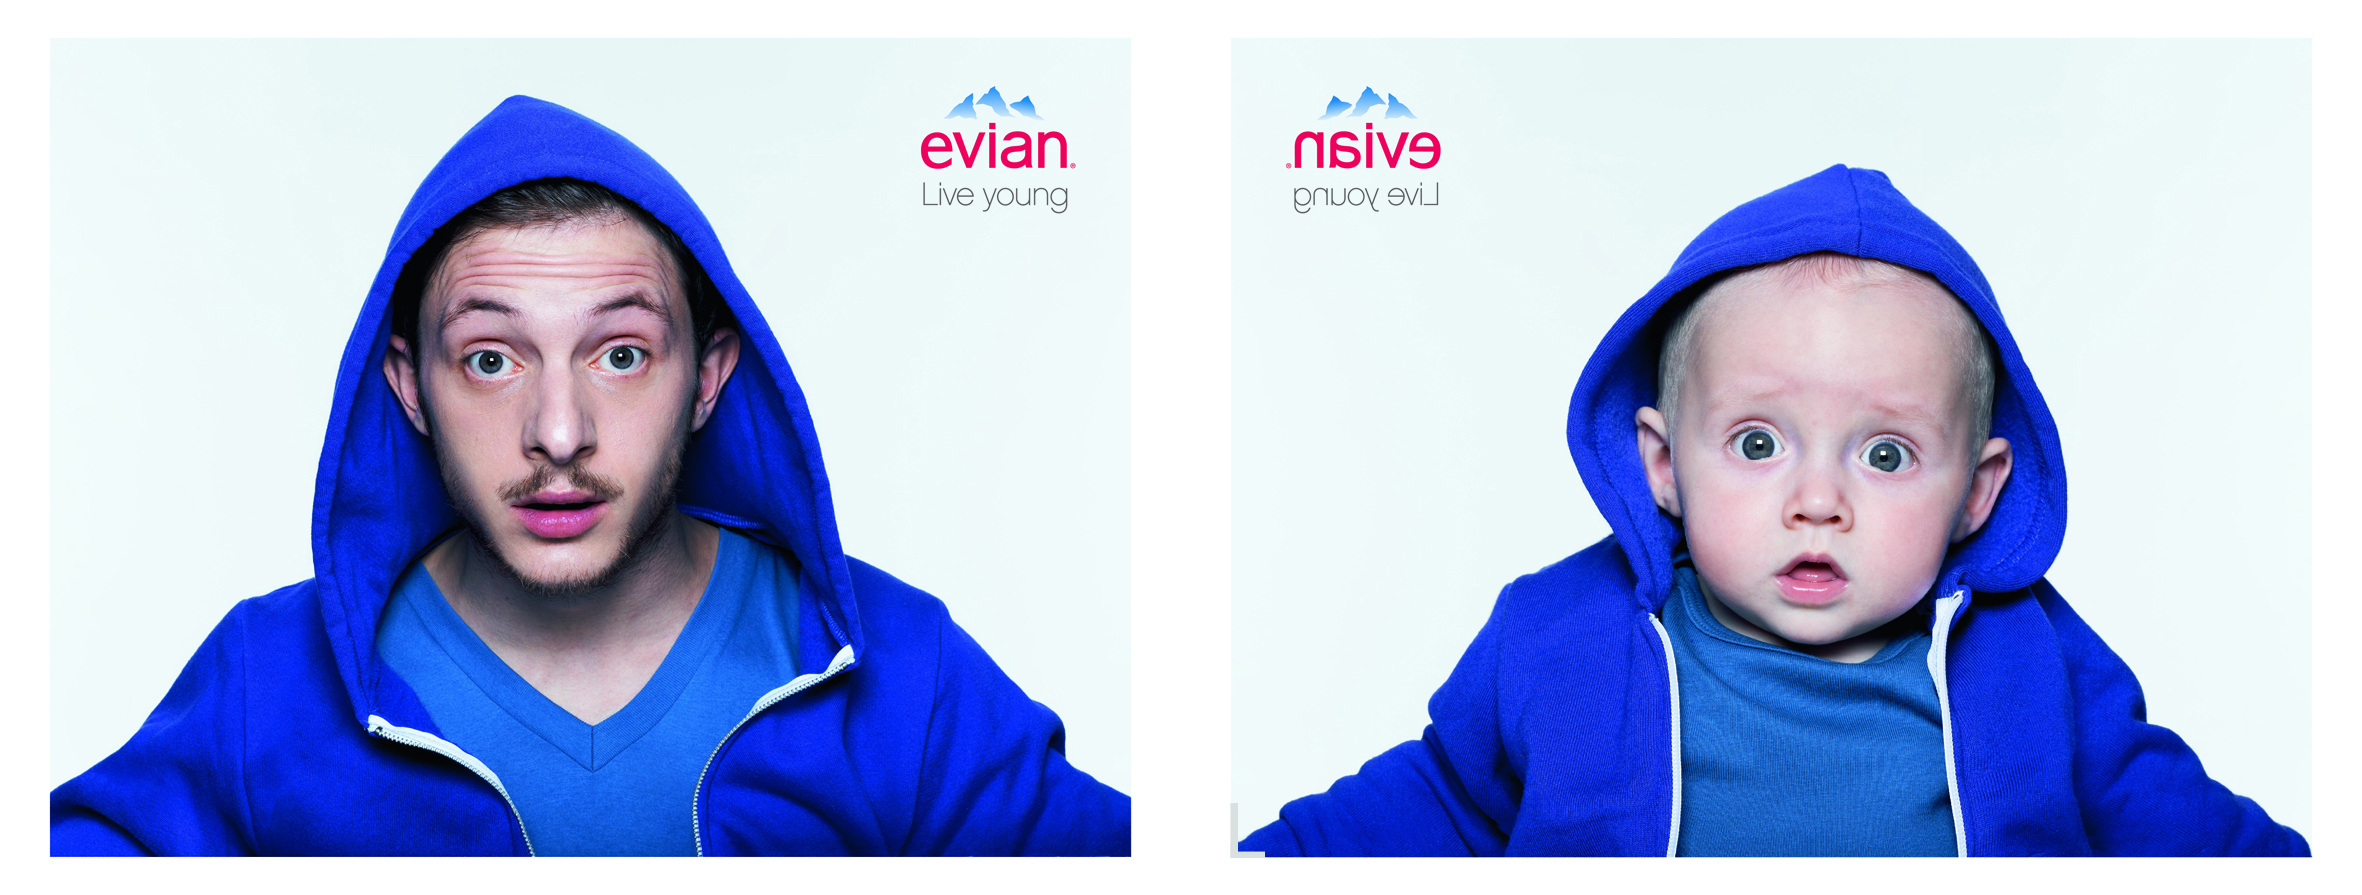 evian-baby&me_4